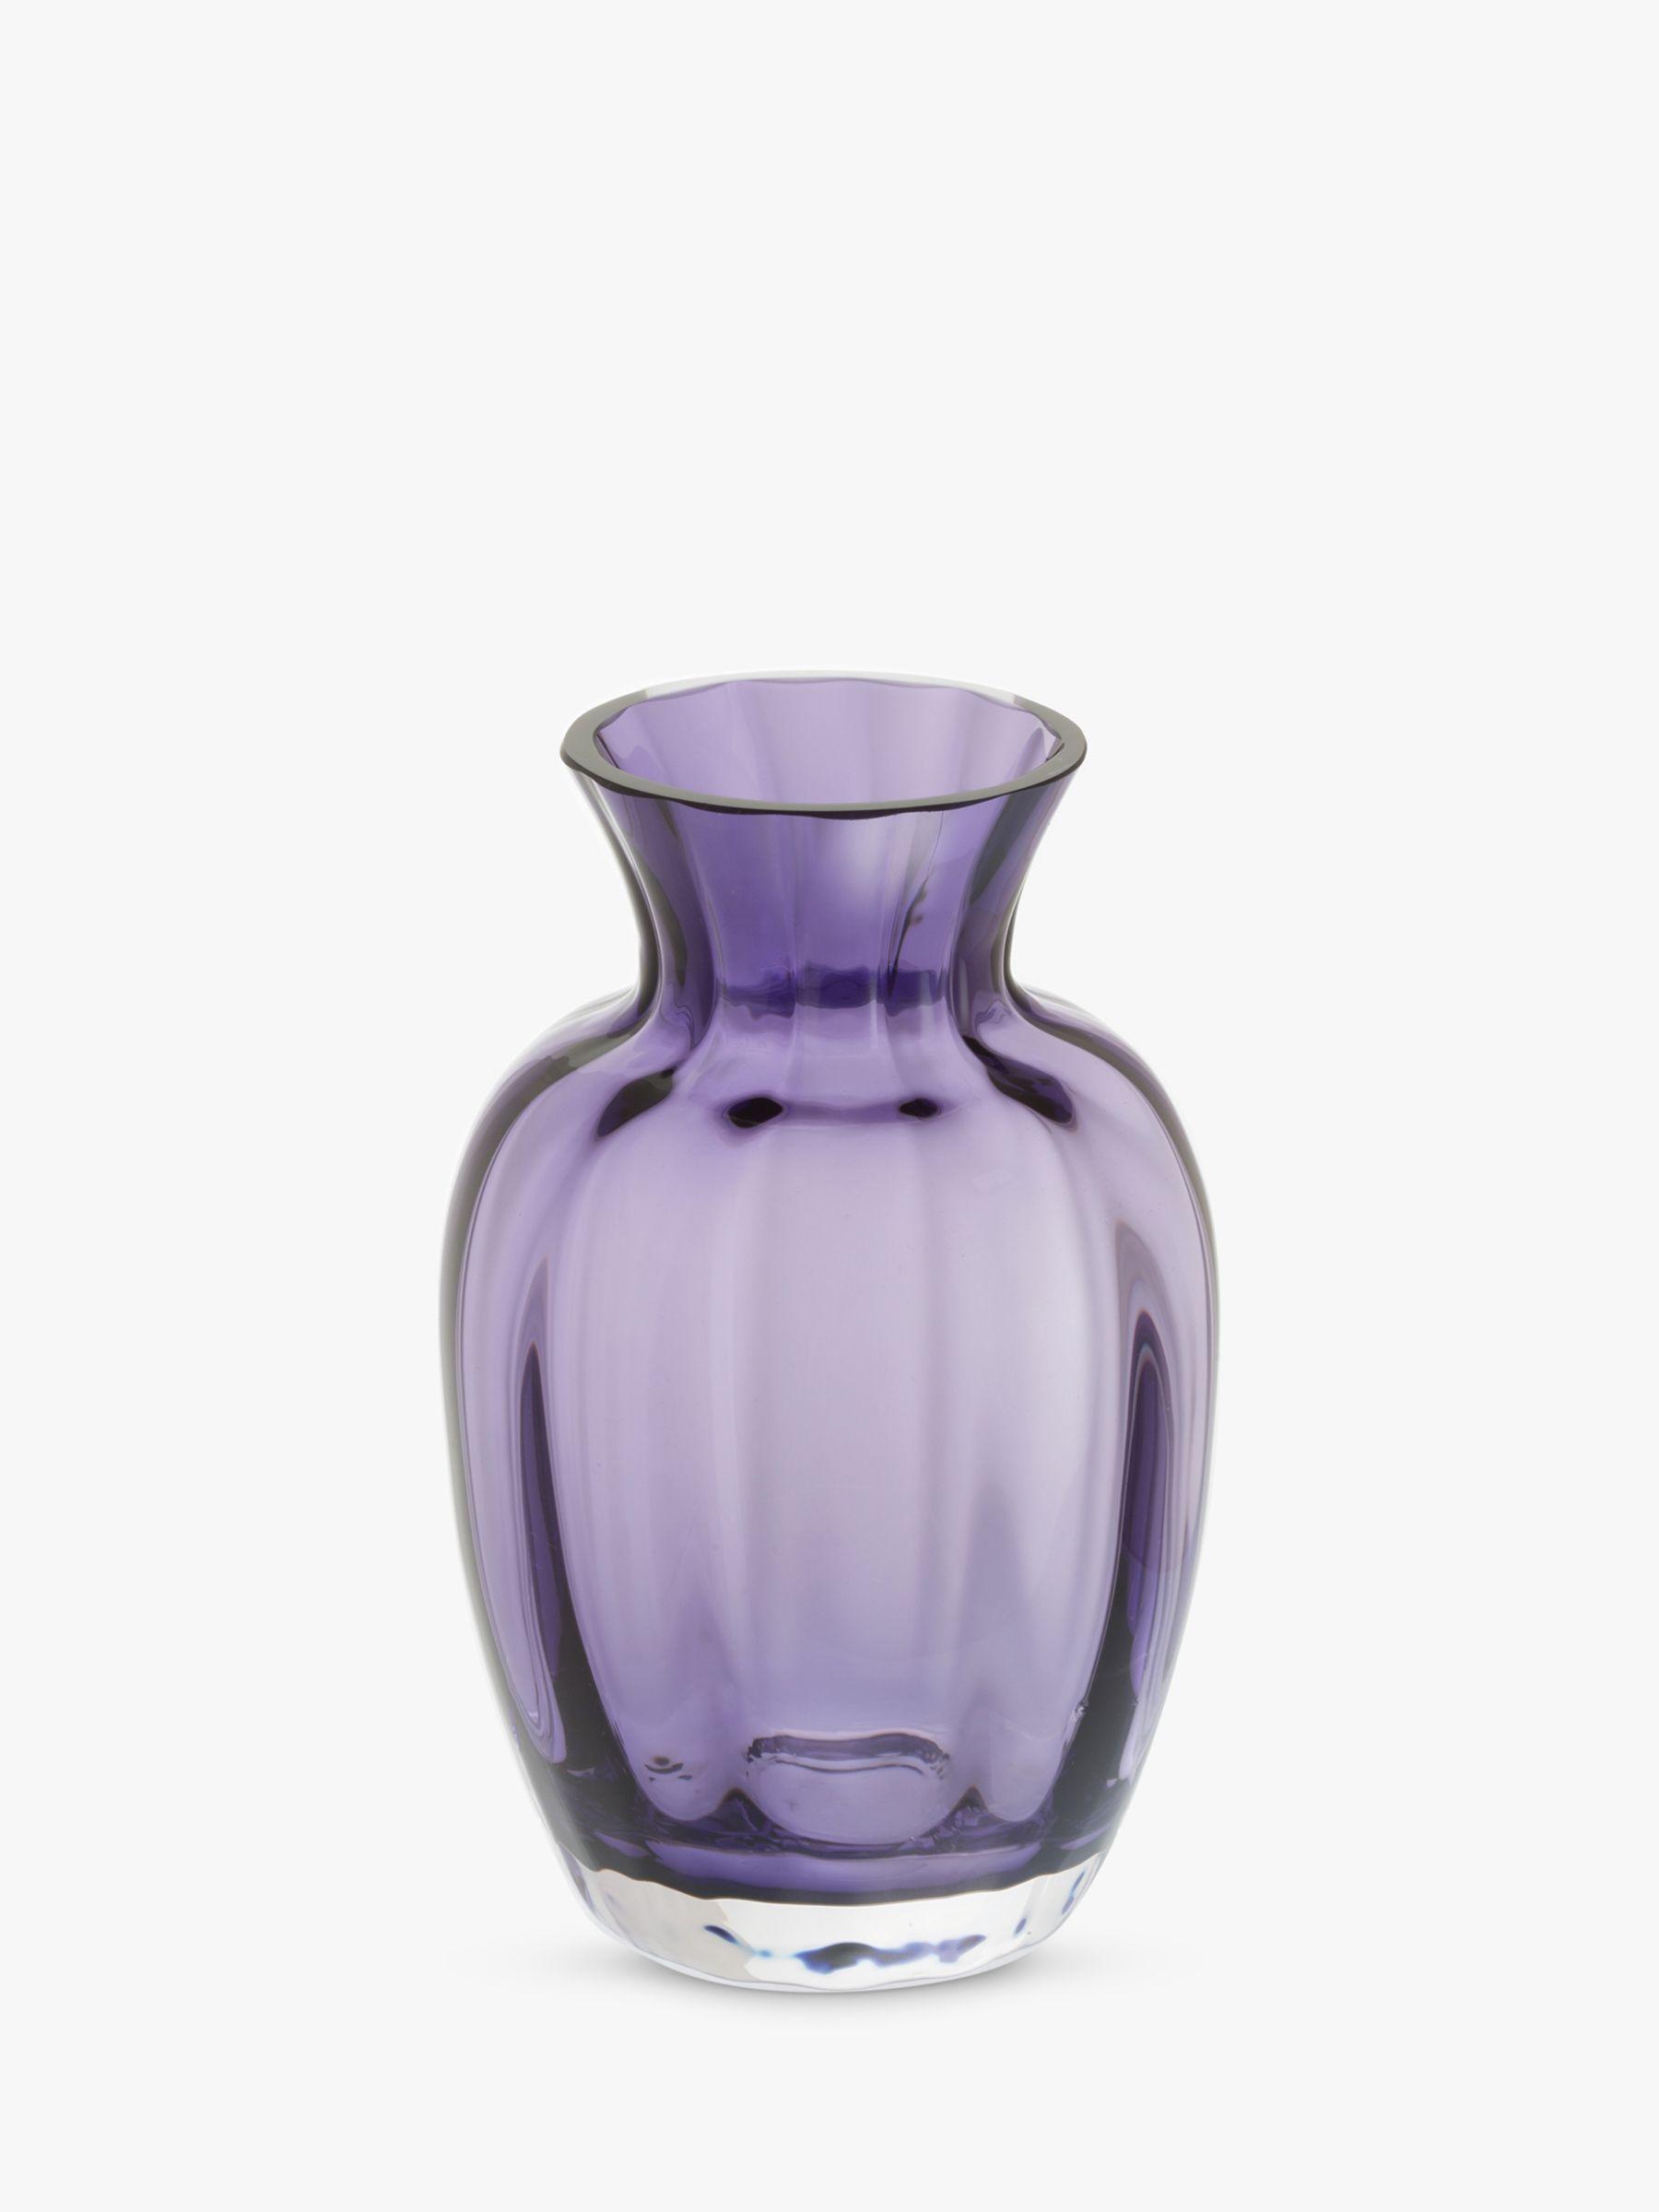 Dartington Crystal Dartington Crystal Little Treasures Vase, Amethyst